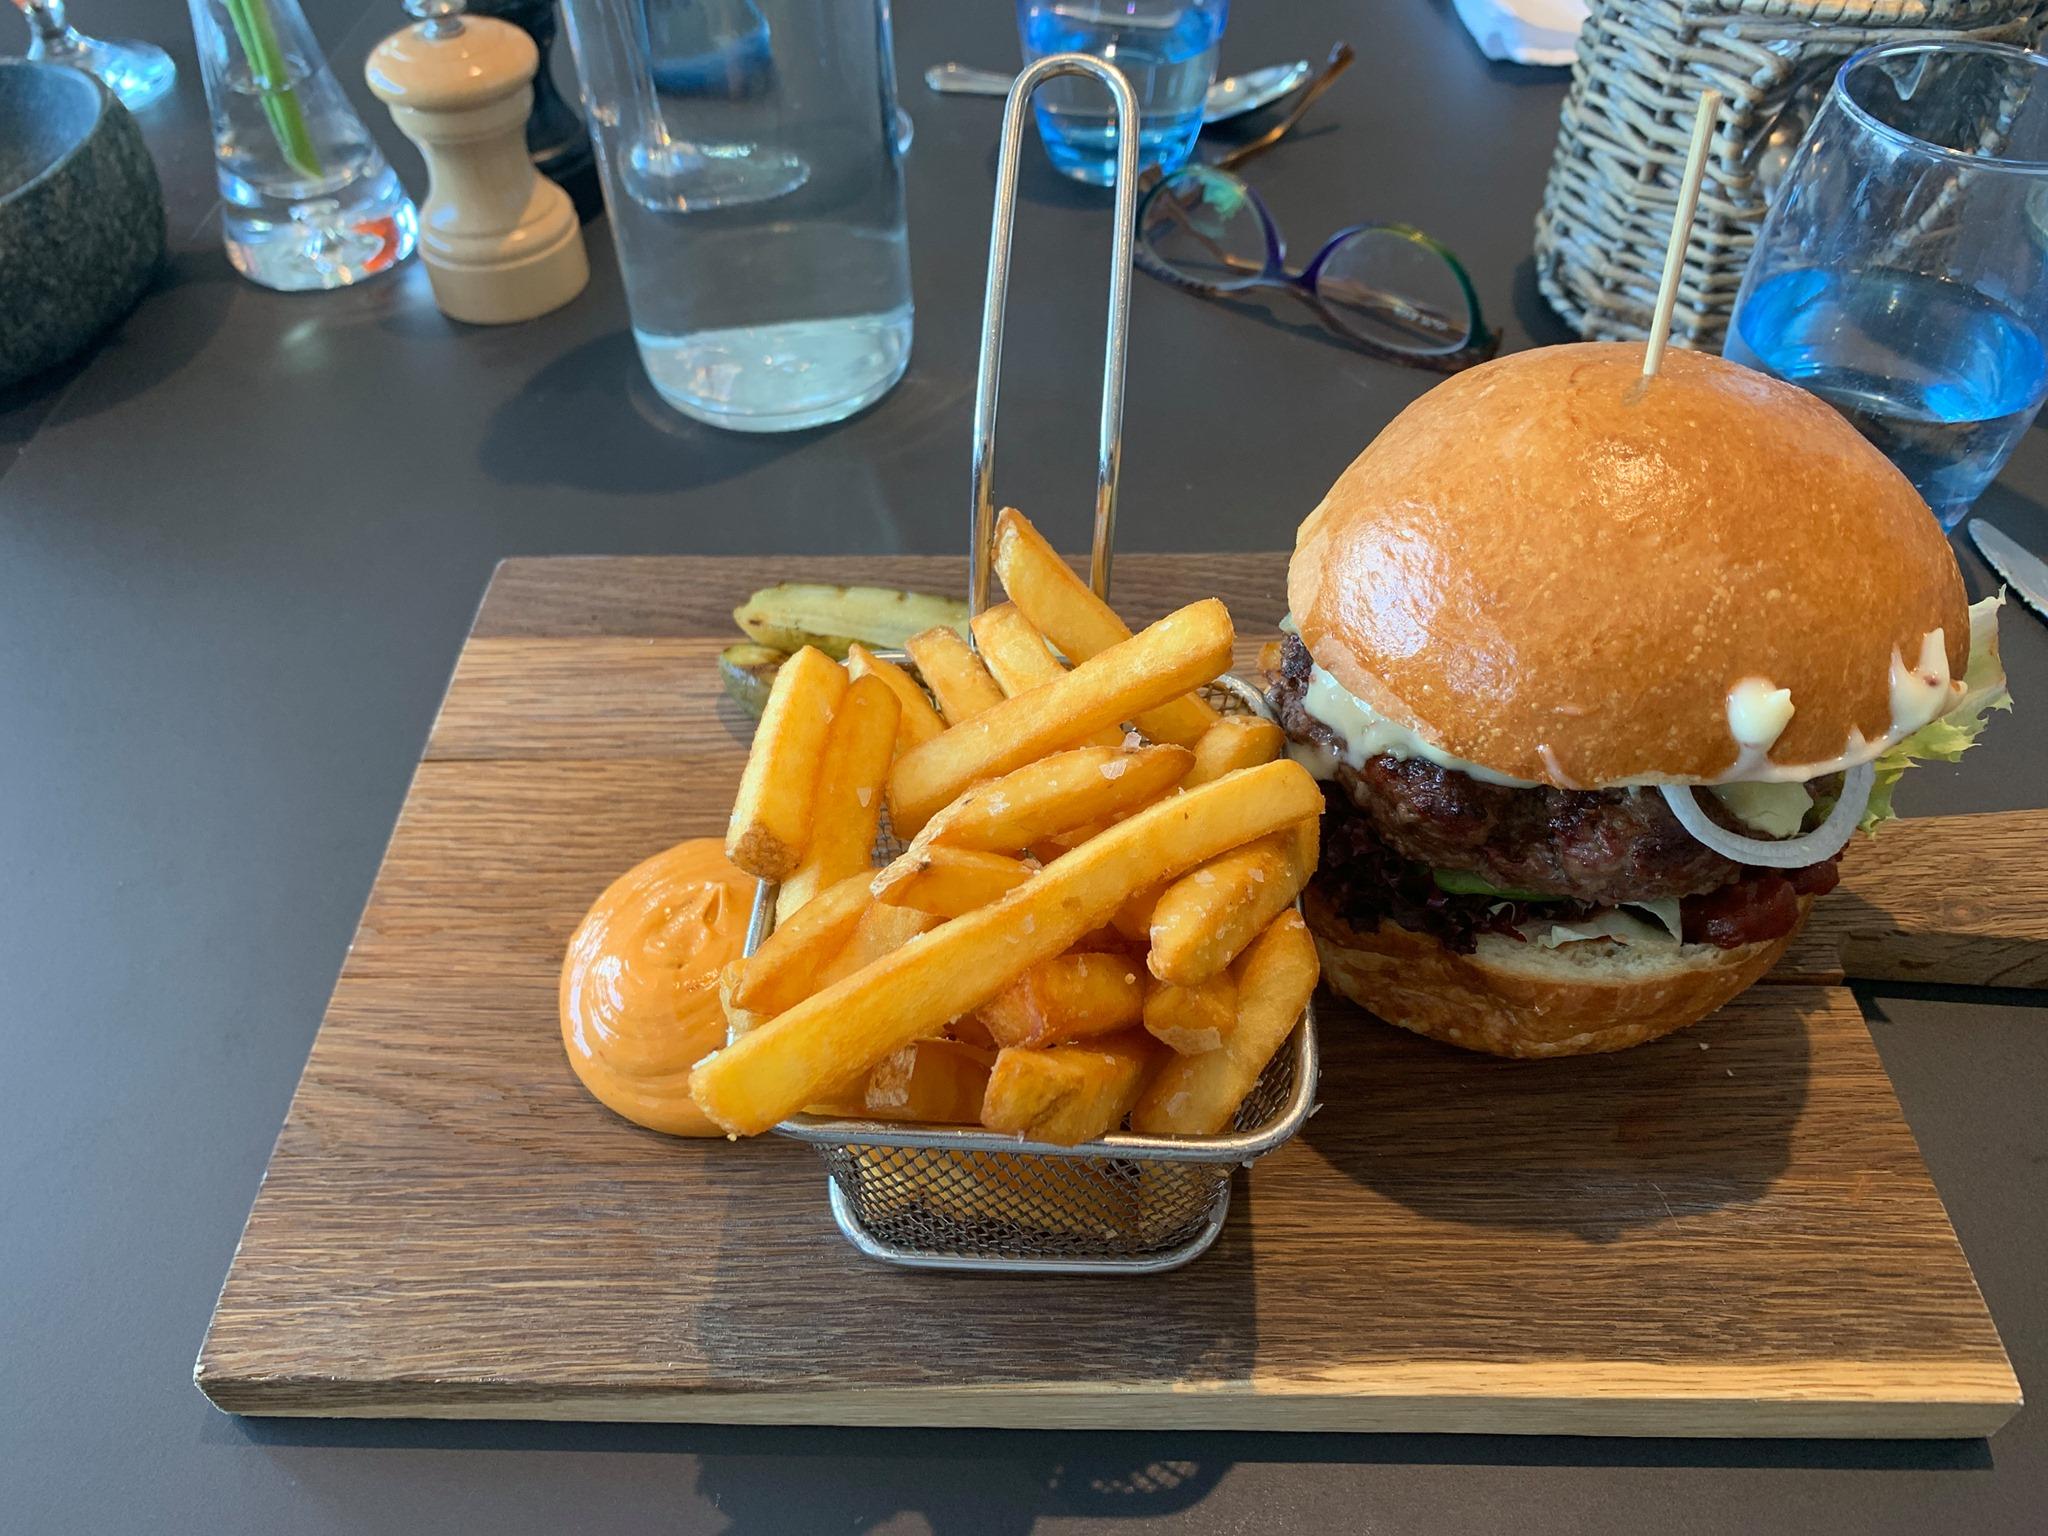 Muskox and reindeer burger.